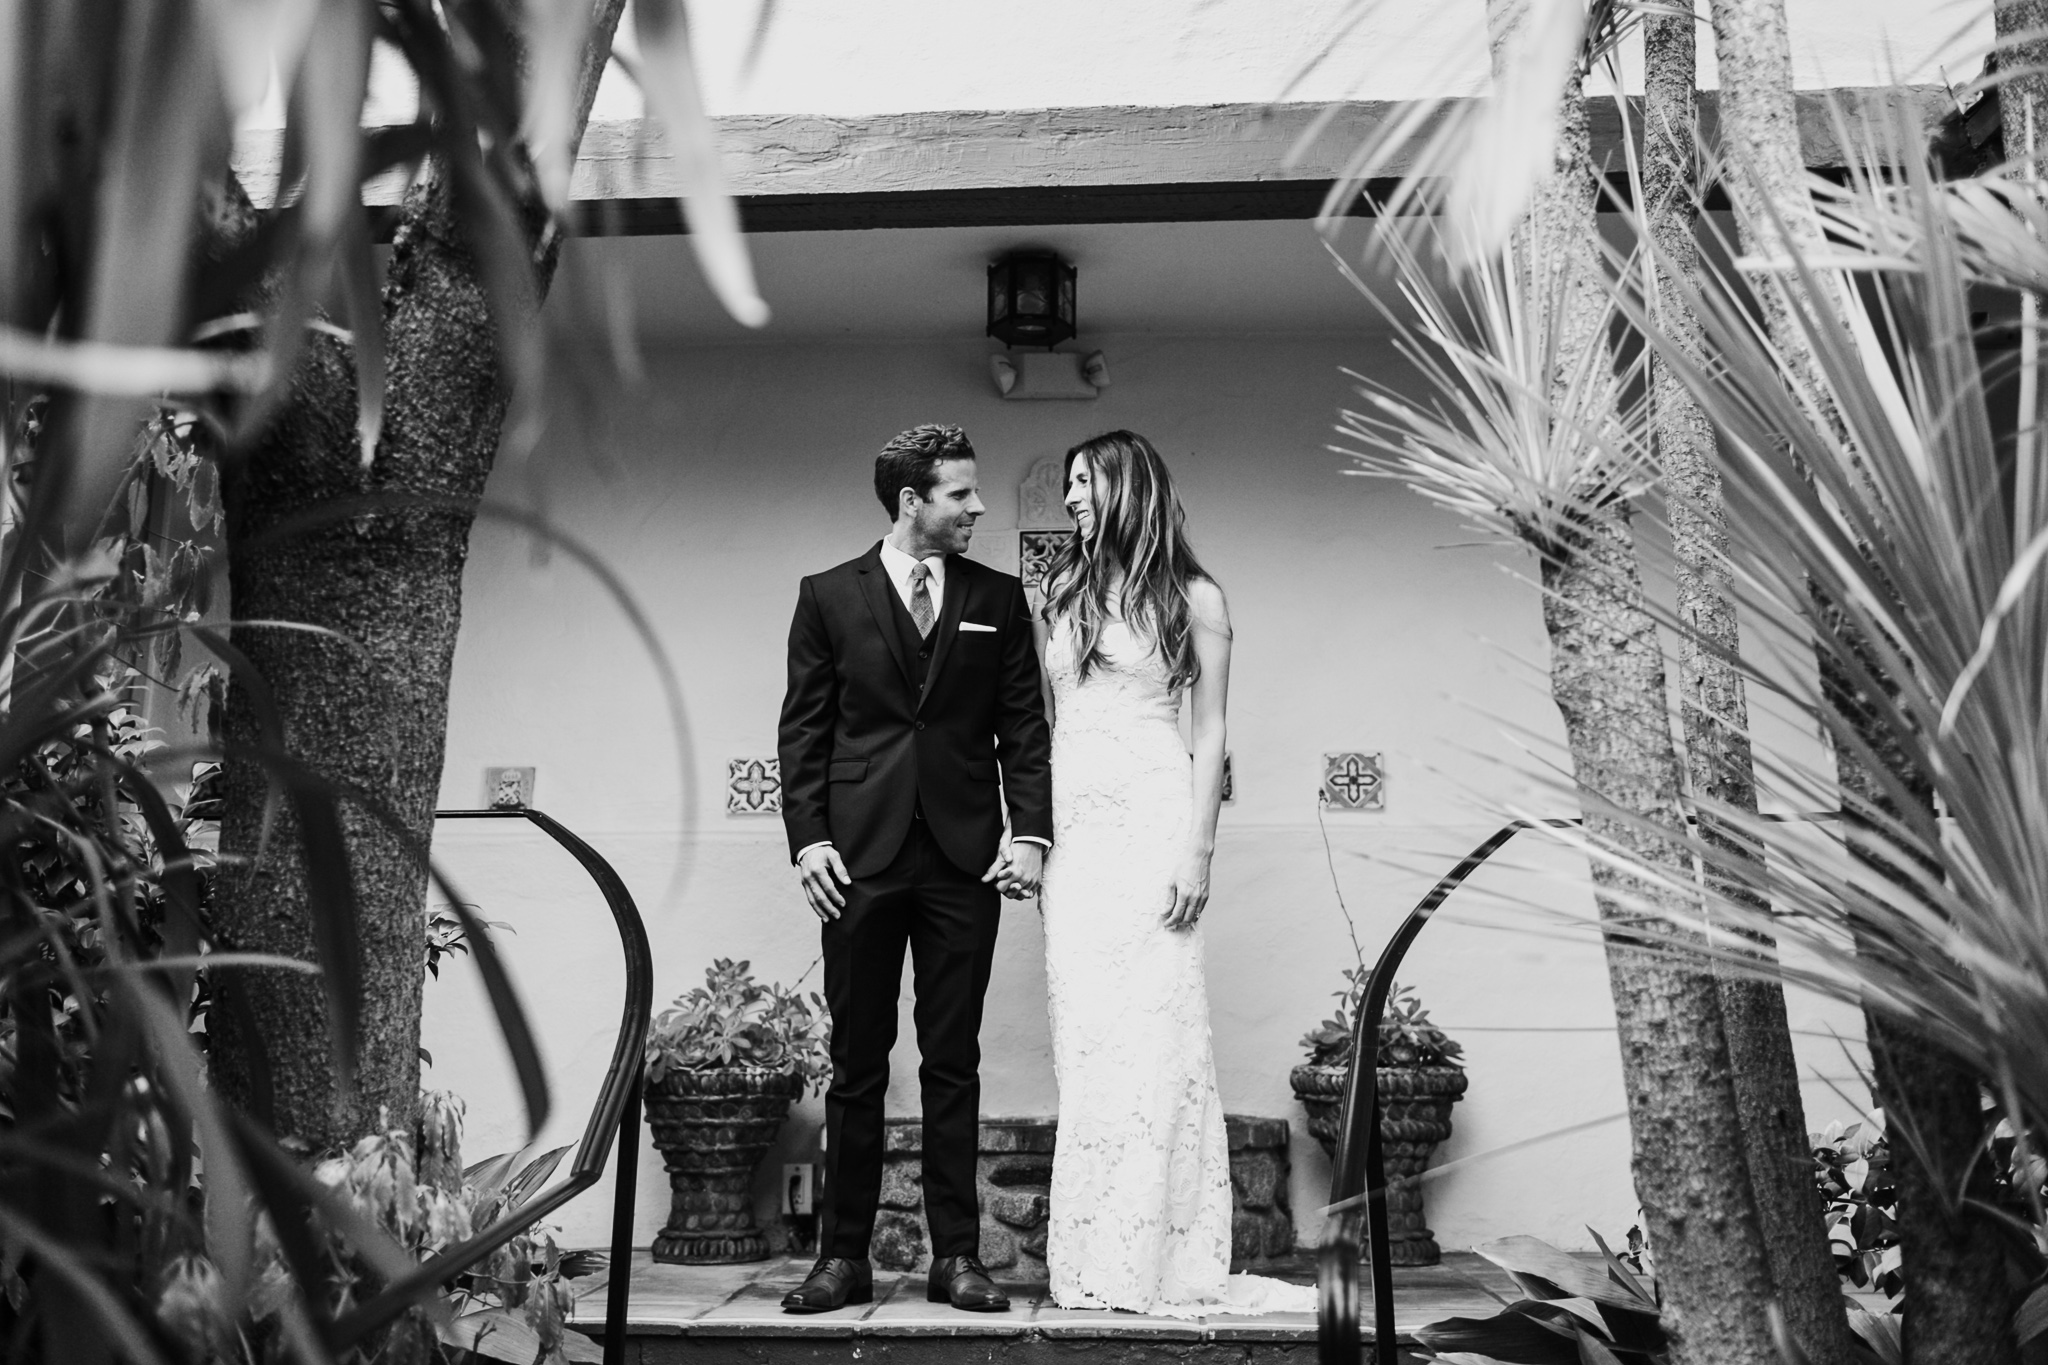 LagunaBeach-WeddingPhotographer-22.jpg